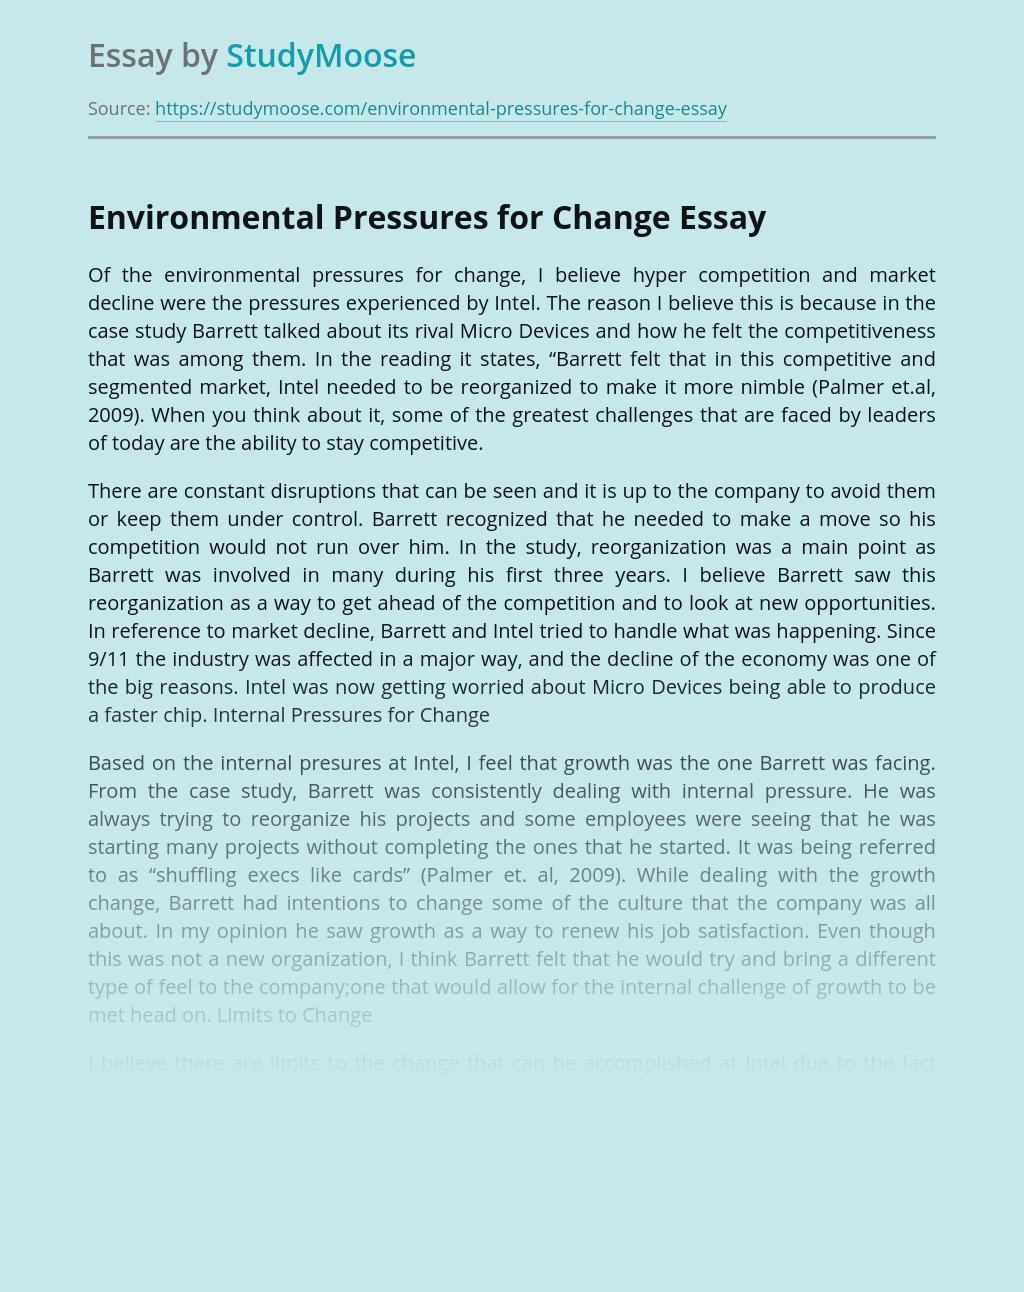 Environmental Pressures for Change